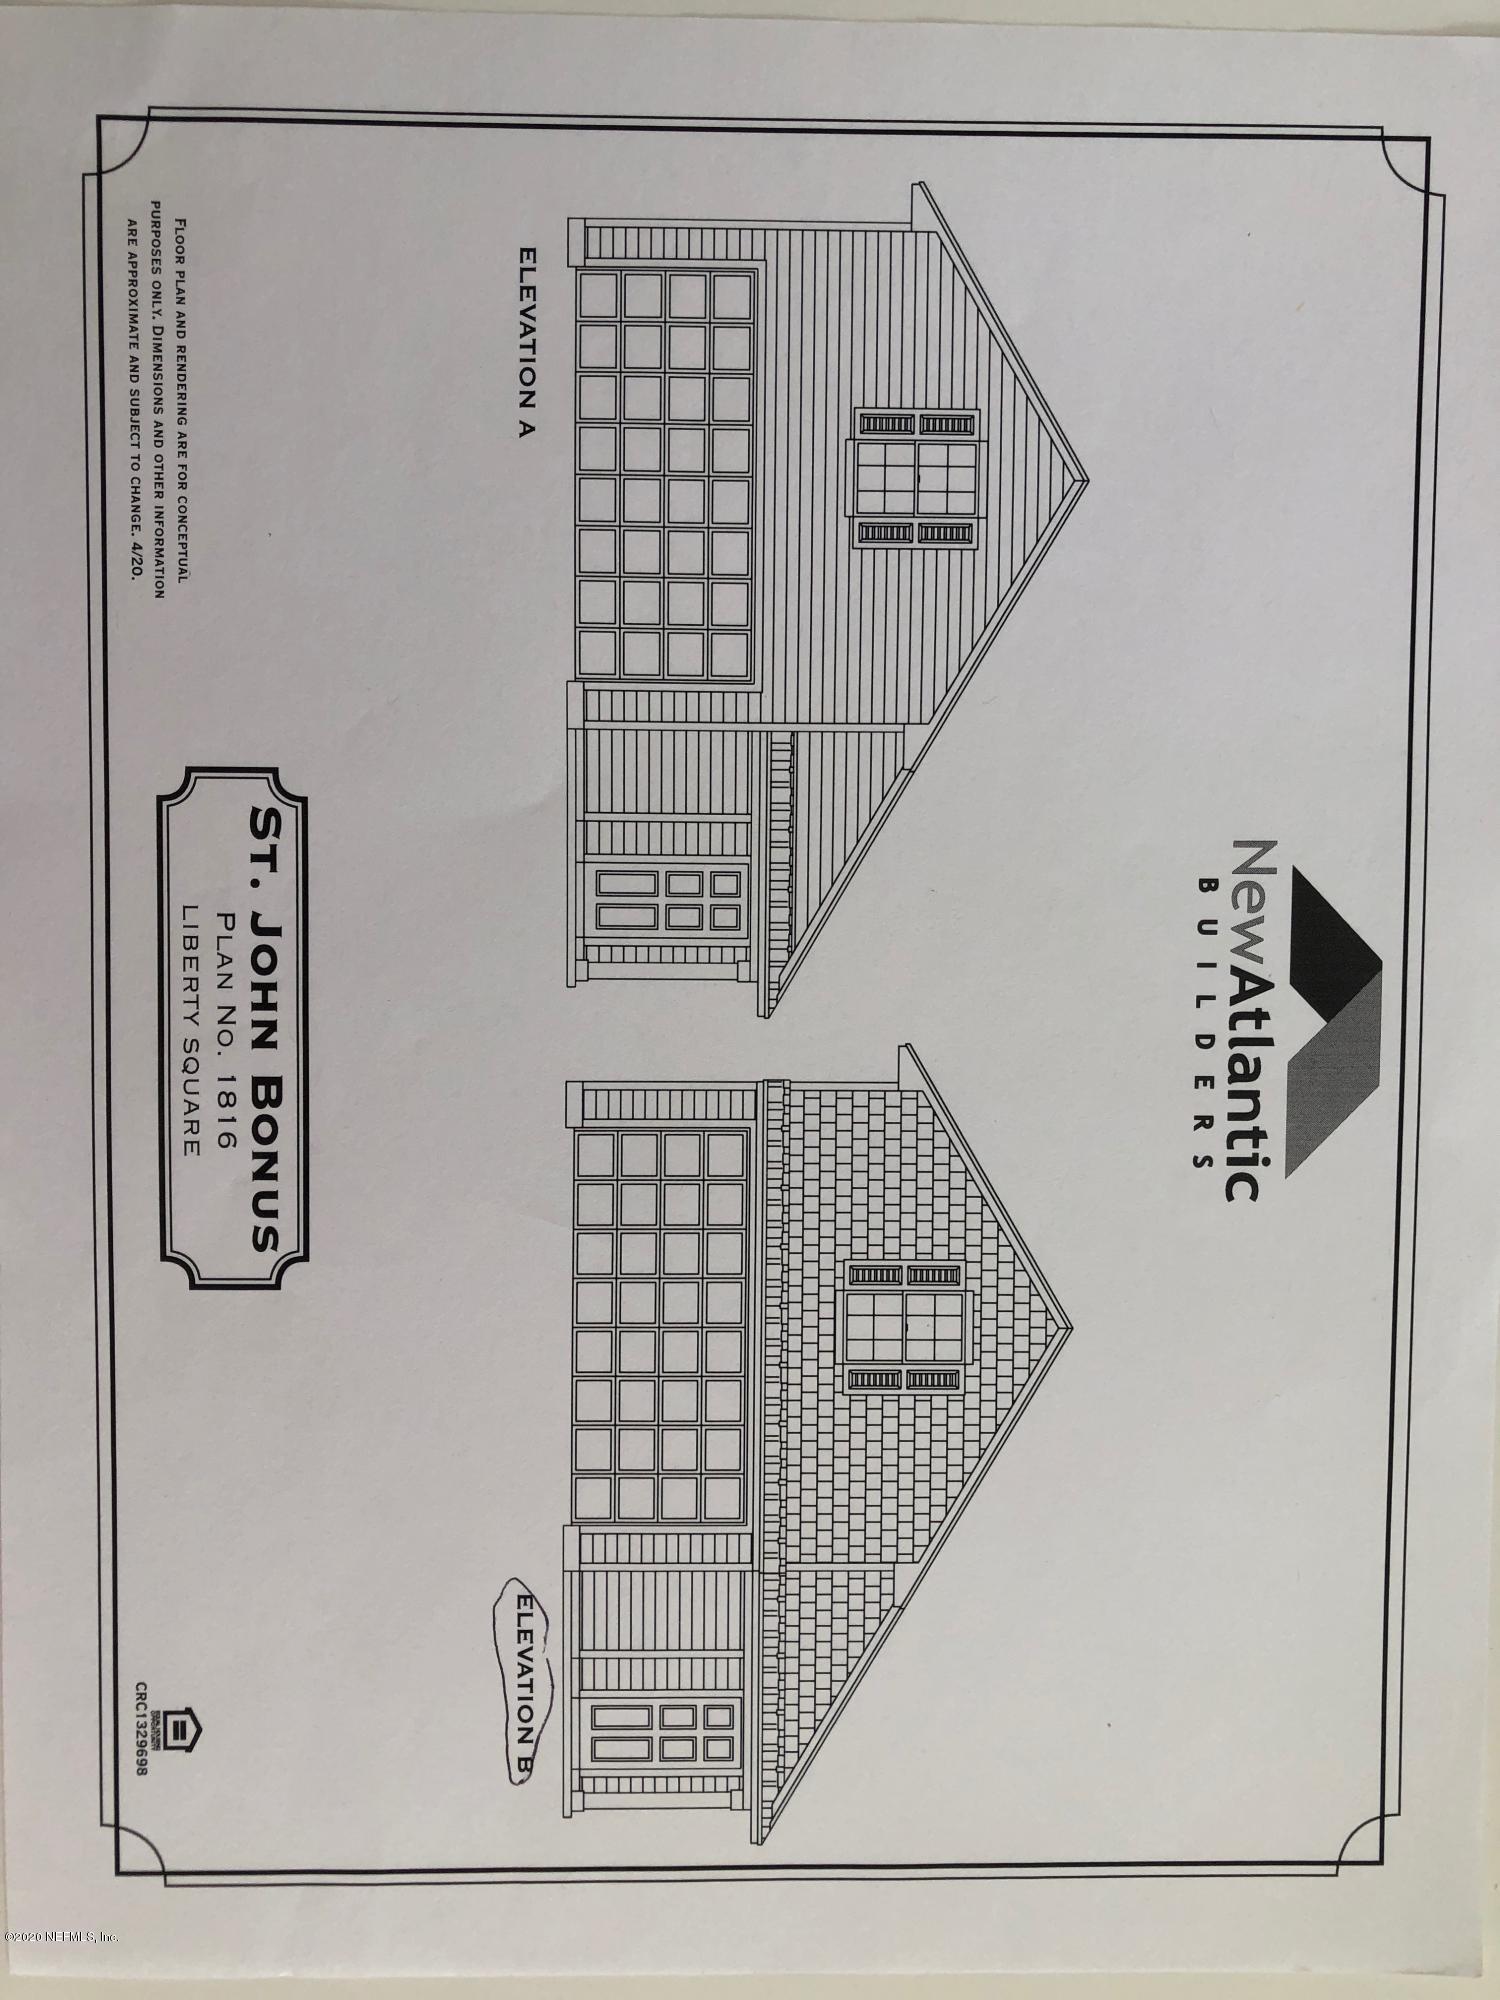 1928 CONSTITUTIONAL REPUBLIC, JACKSONVILLE, FLORIDA 32221, 4 Bedrooms Bedrooms, ,3 BathroomsBathrooms,Residential,For sale,CONSTITUTIONAL REPUBLIC,1070265